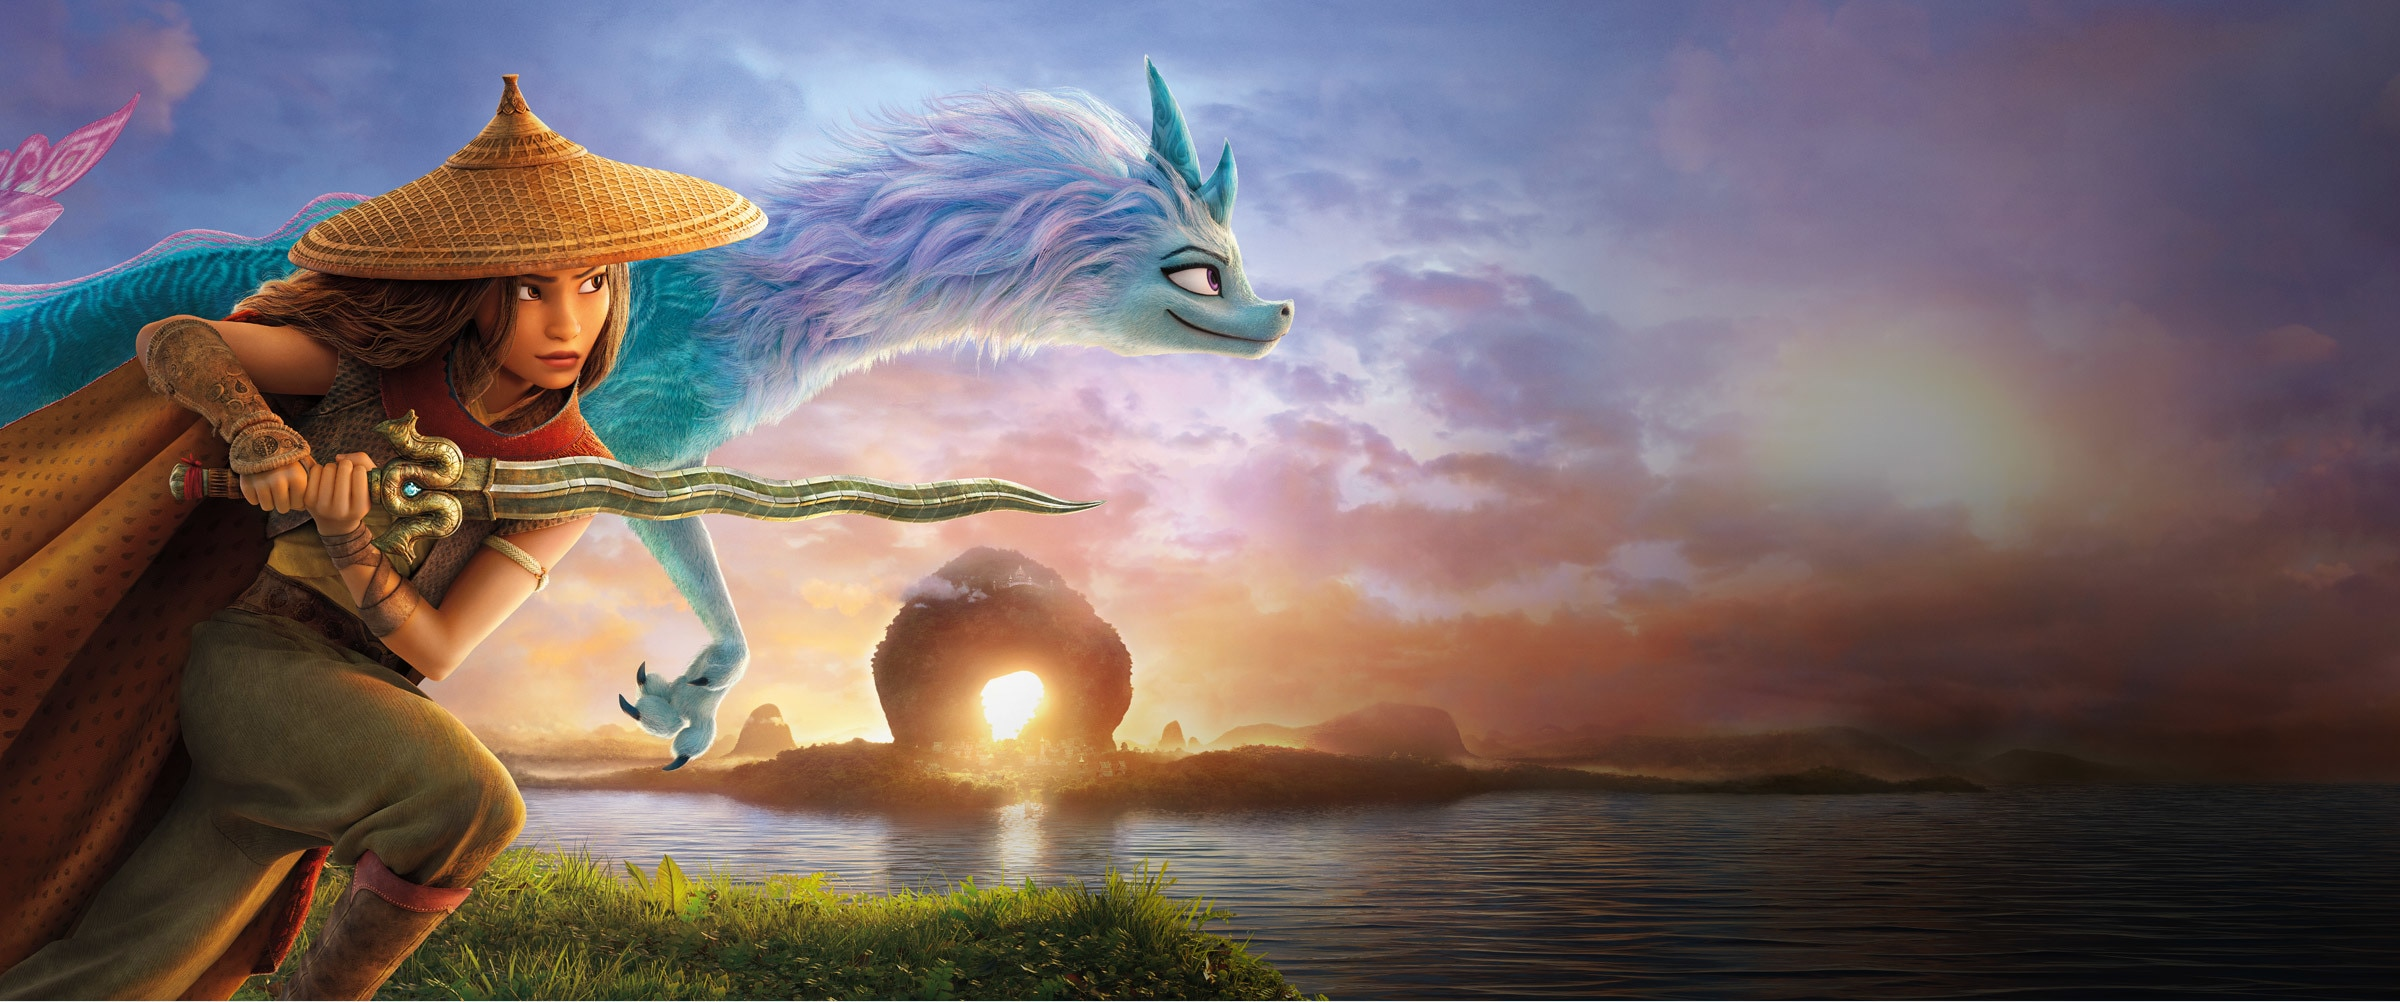 Raya and the Last Dragon | Showcase | Hero | Disney+